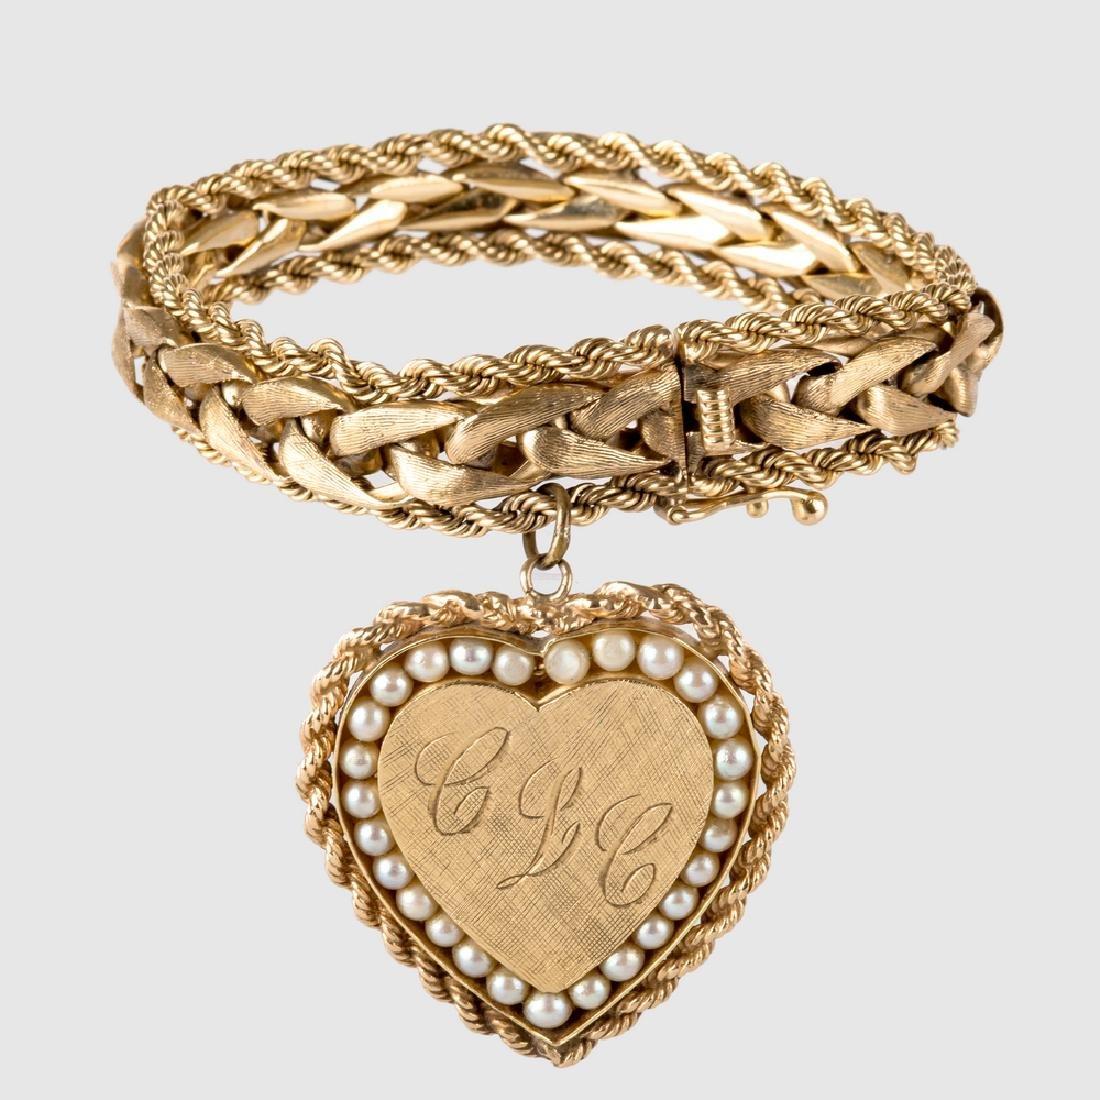 14 KARAT YELLOW GOLD BRACELET WITH 18 KARAT GOLD AND